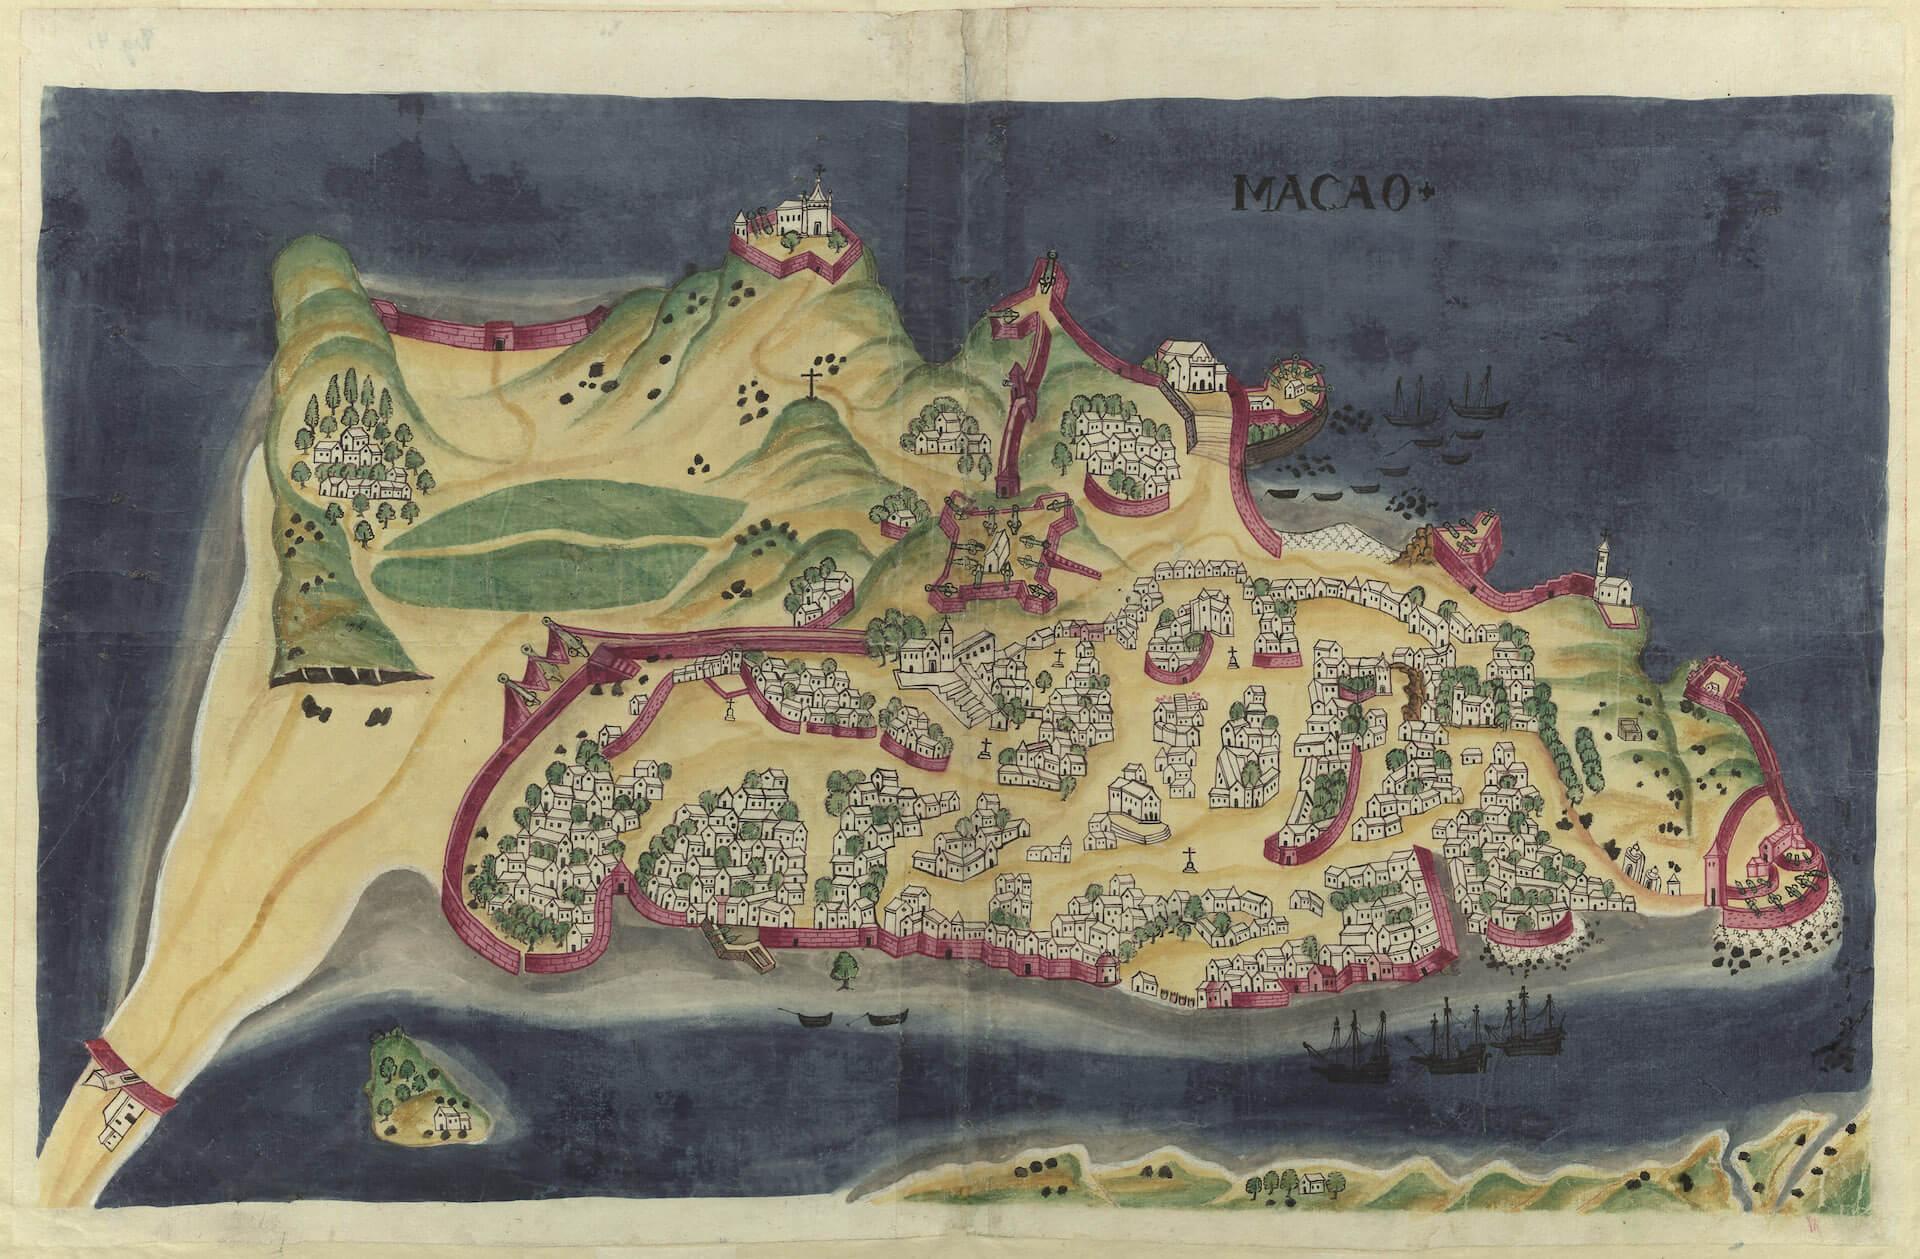 Macao siglo XVII